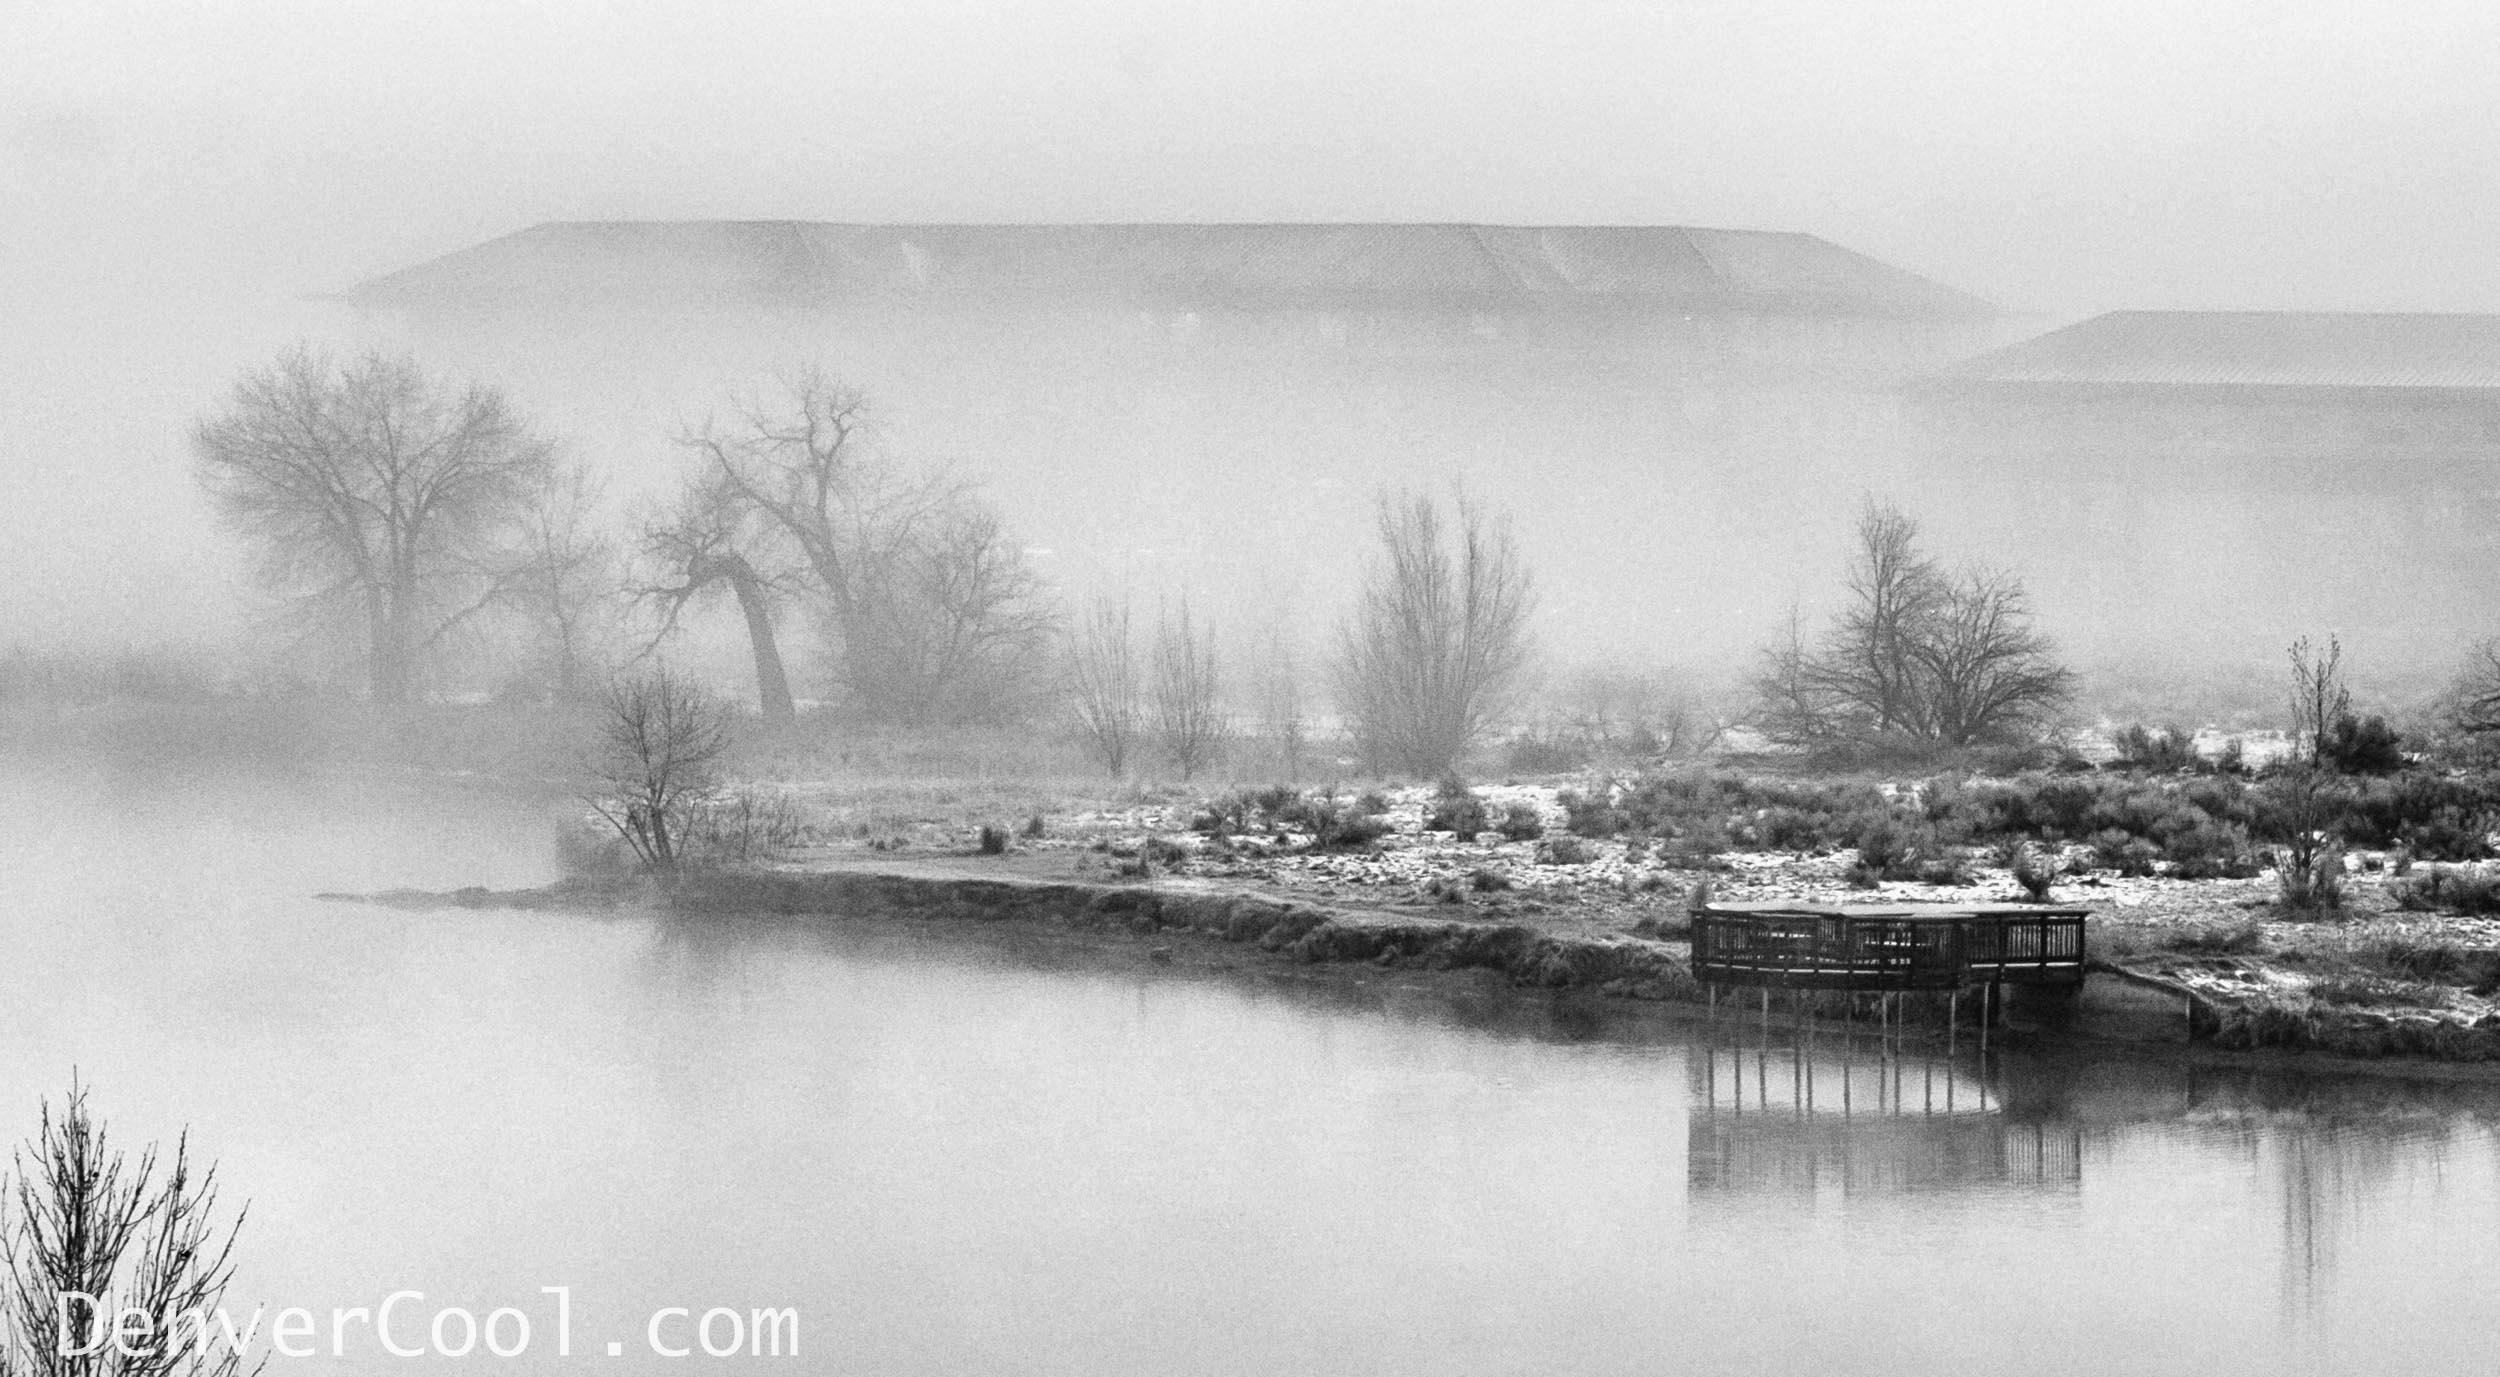 Foggy Morinng on the Lake